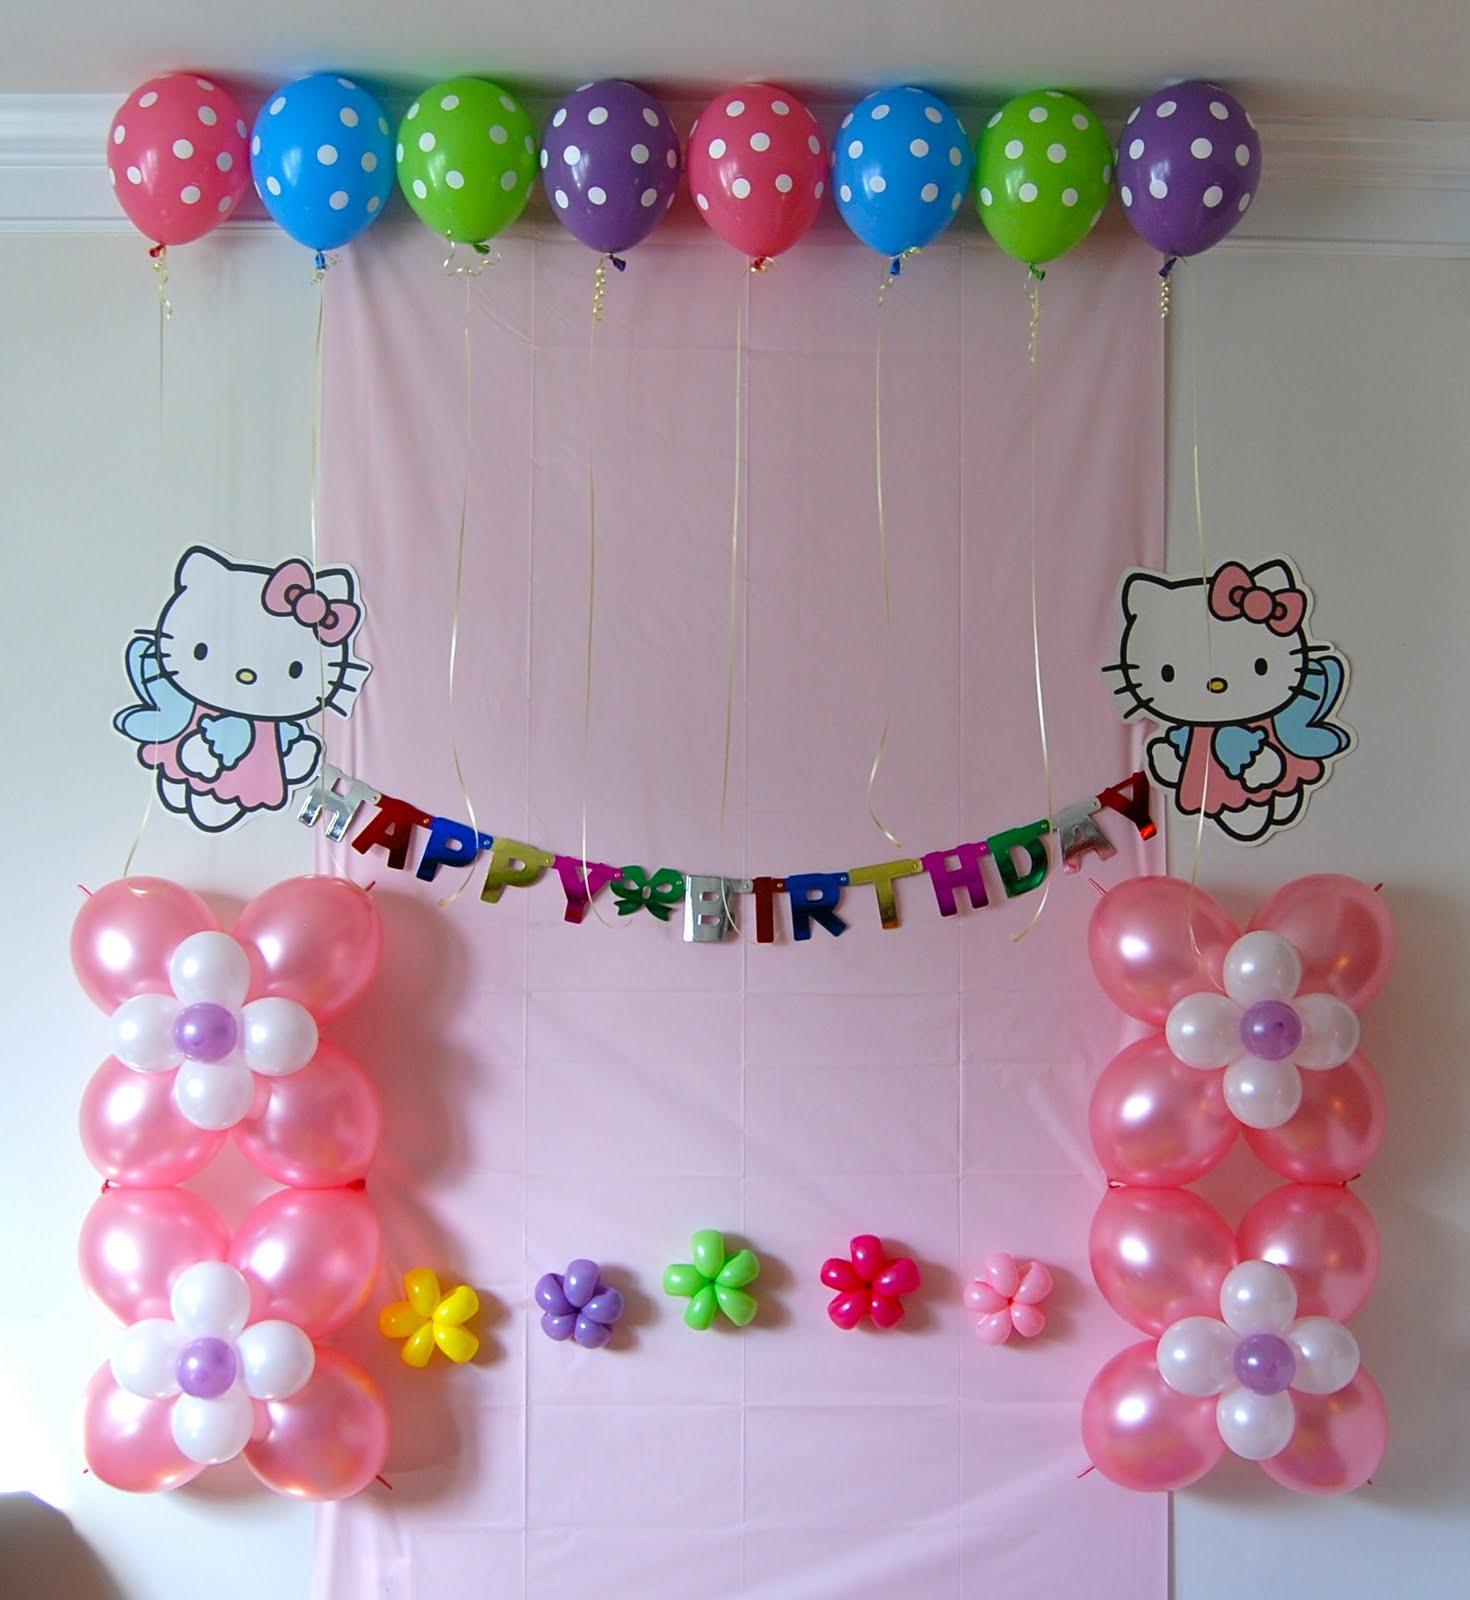 Balloon Decoration At Home: Balloon Decor-Twisting & Glitter Tattoos